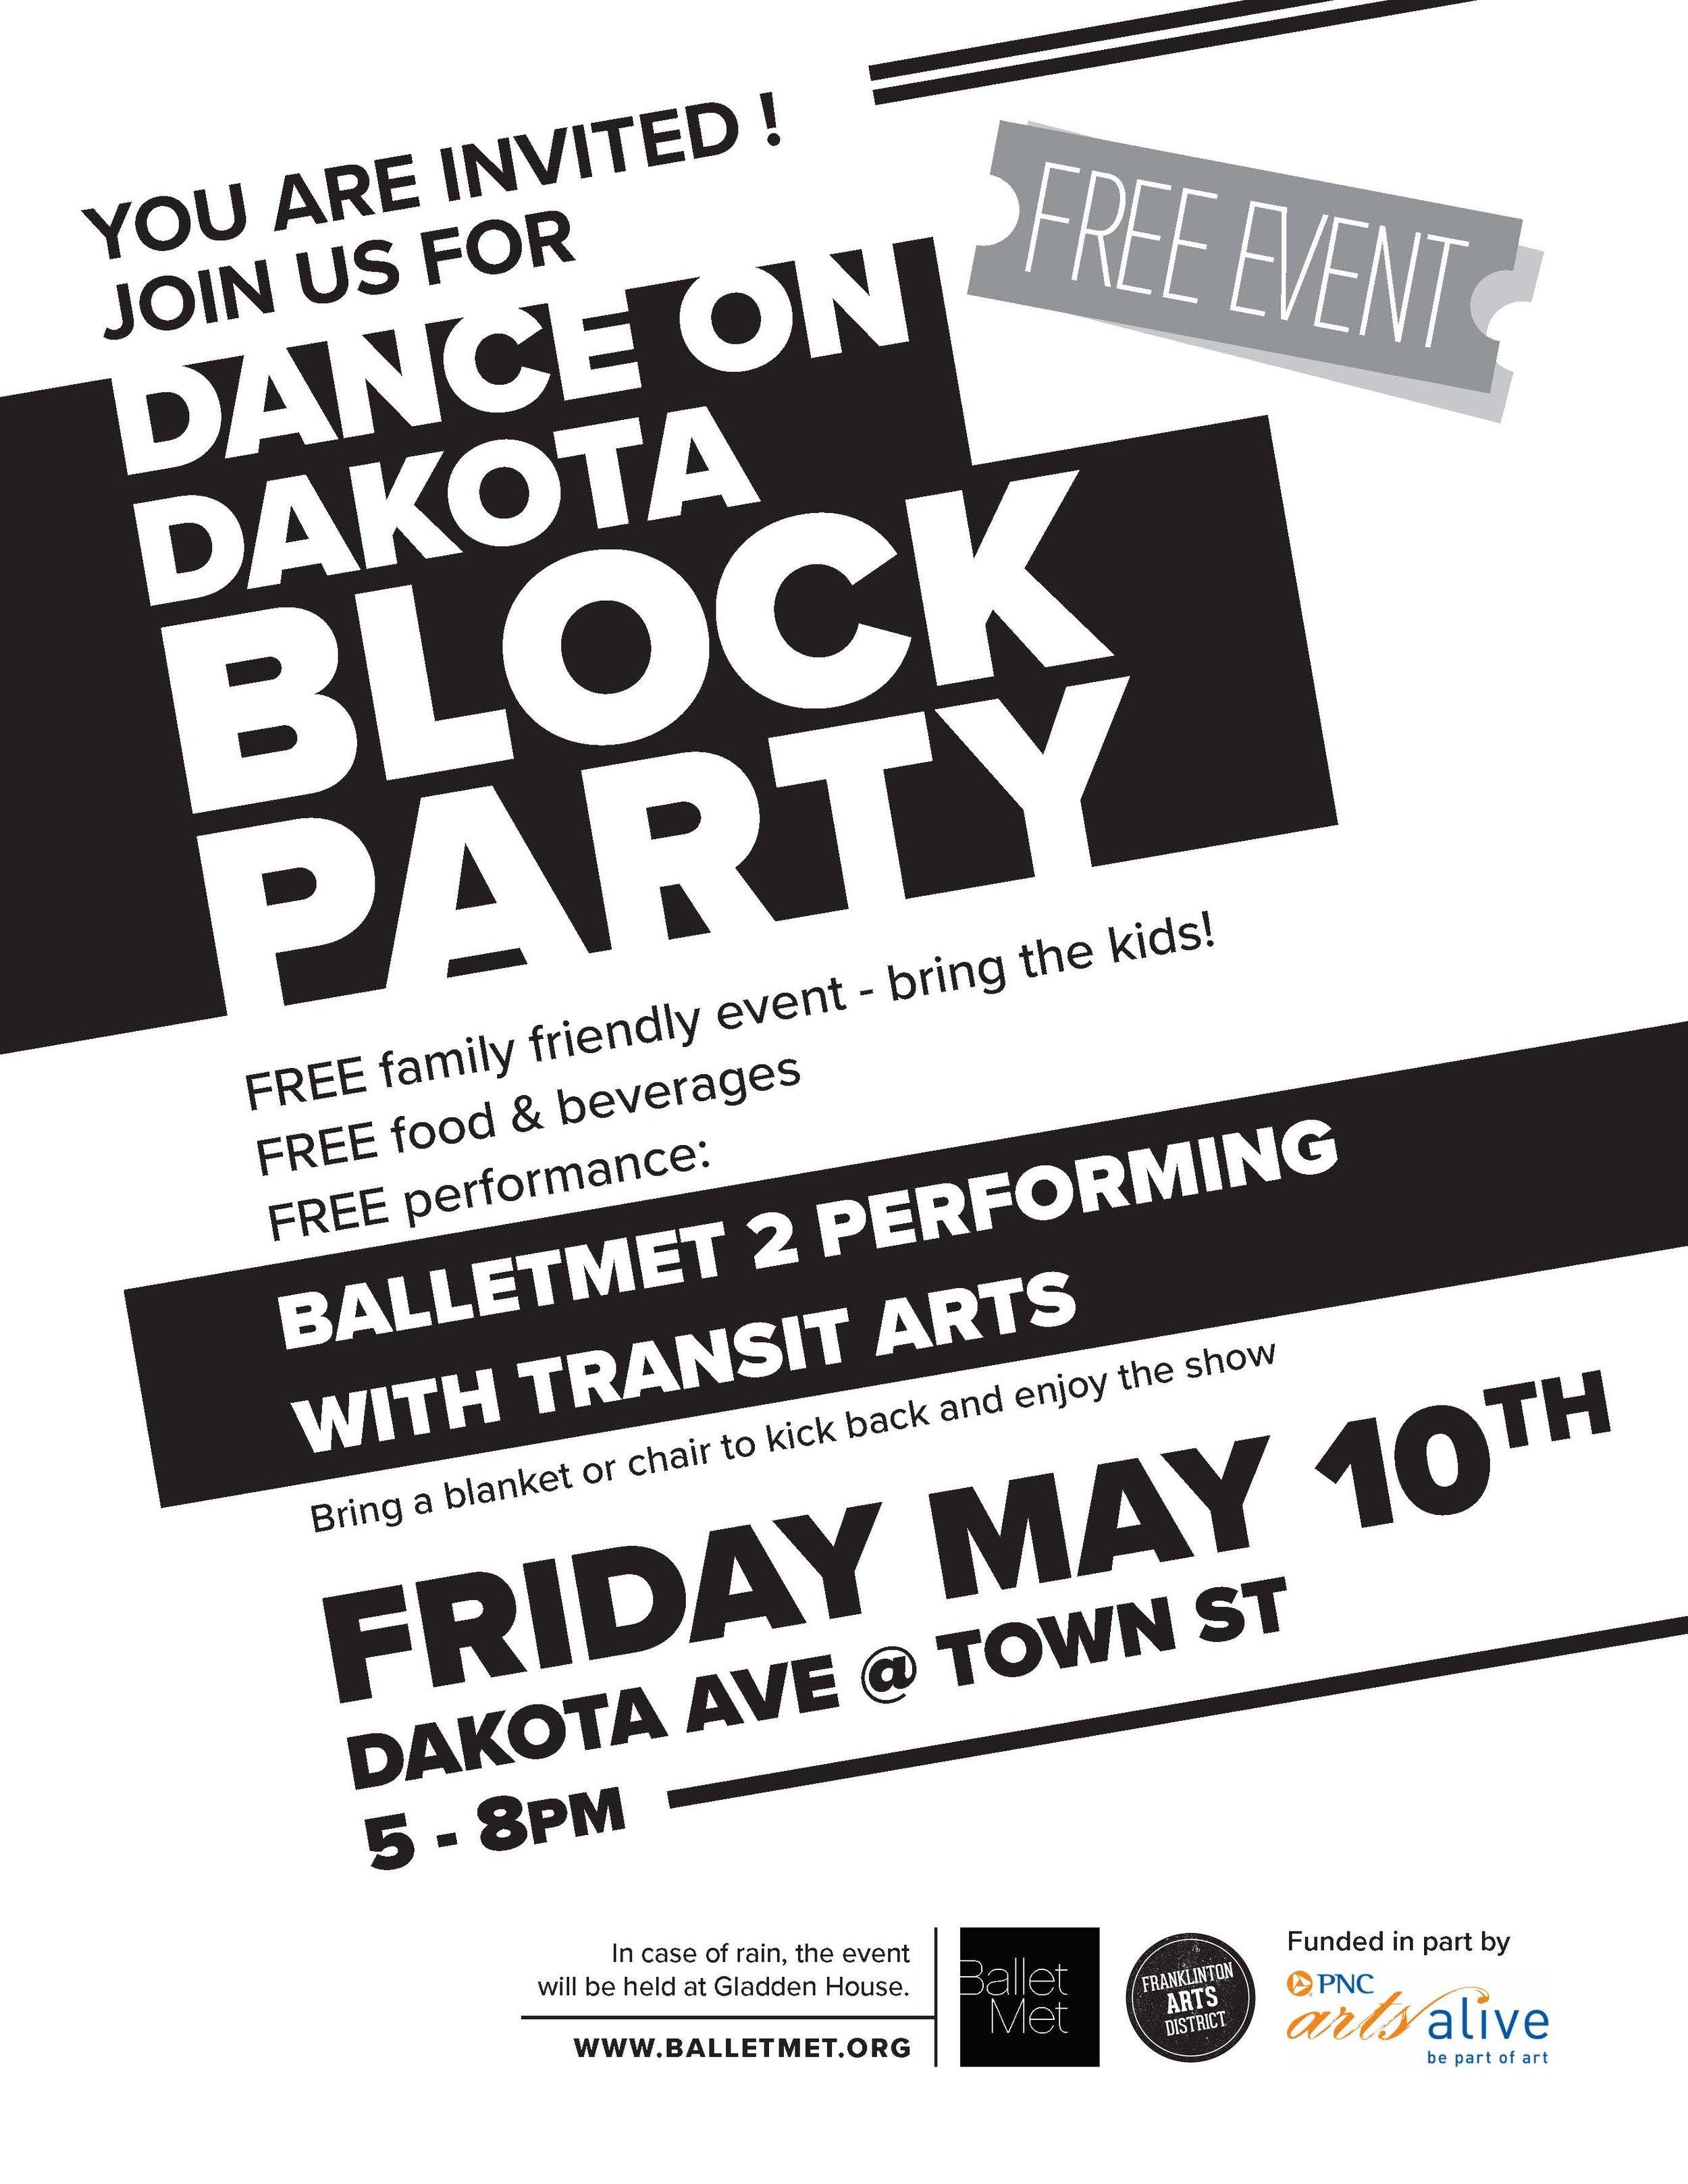 DanceOnDakota-May10-Flyer (Fri) (002).jpg